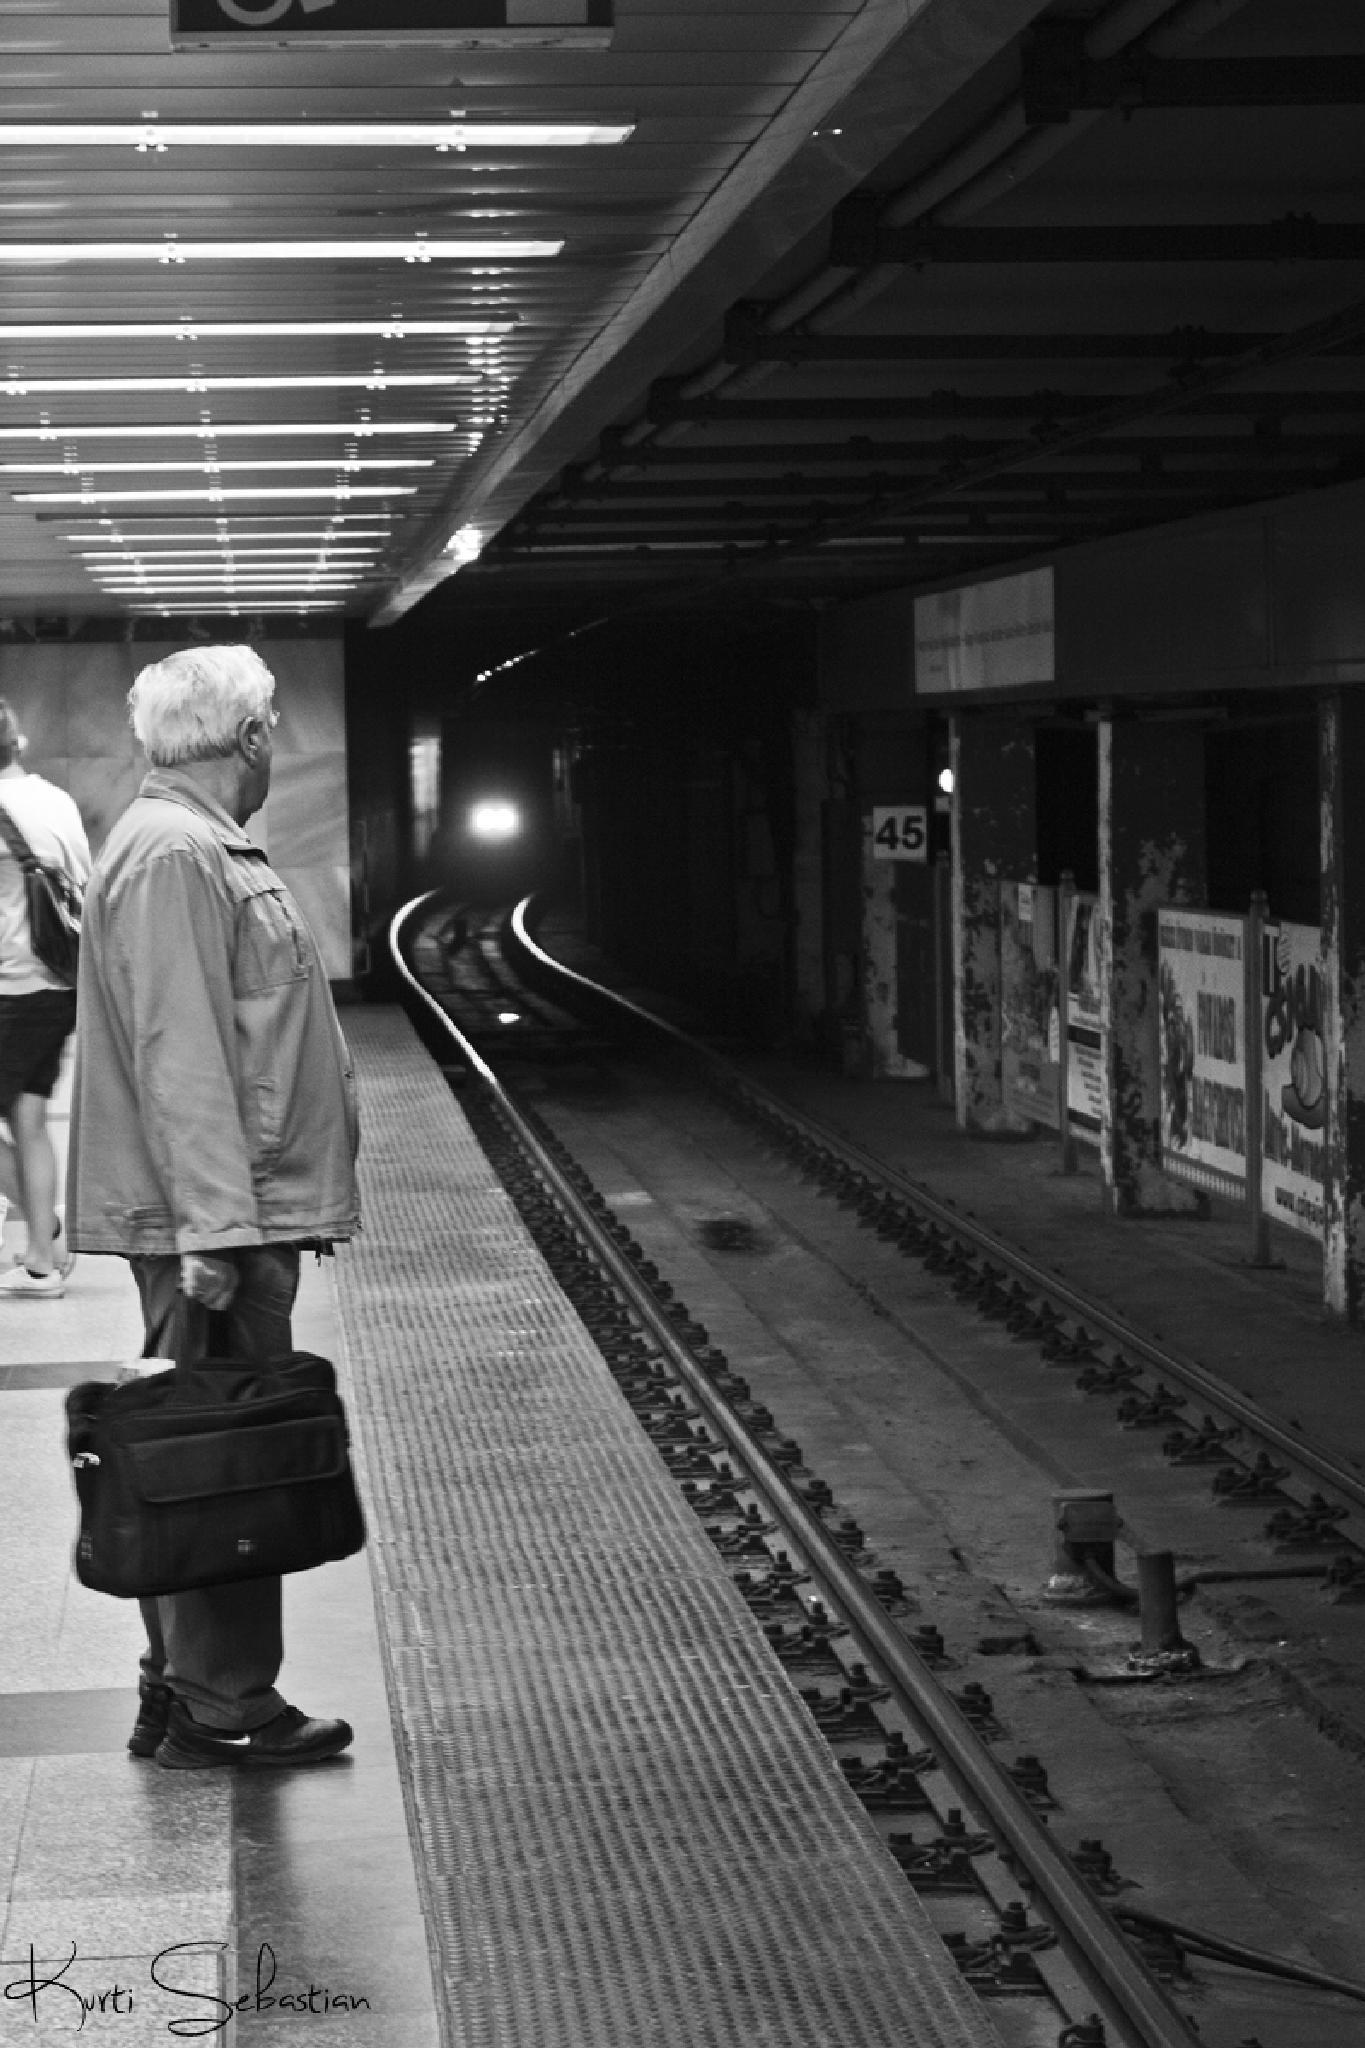 Old man waiting in the underground subway by Sebastián Kurti